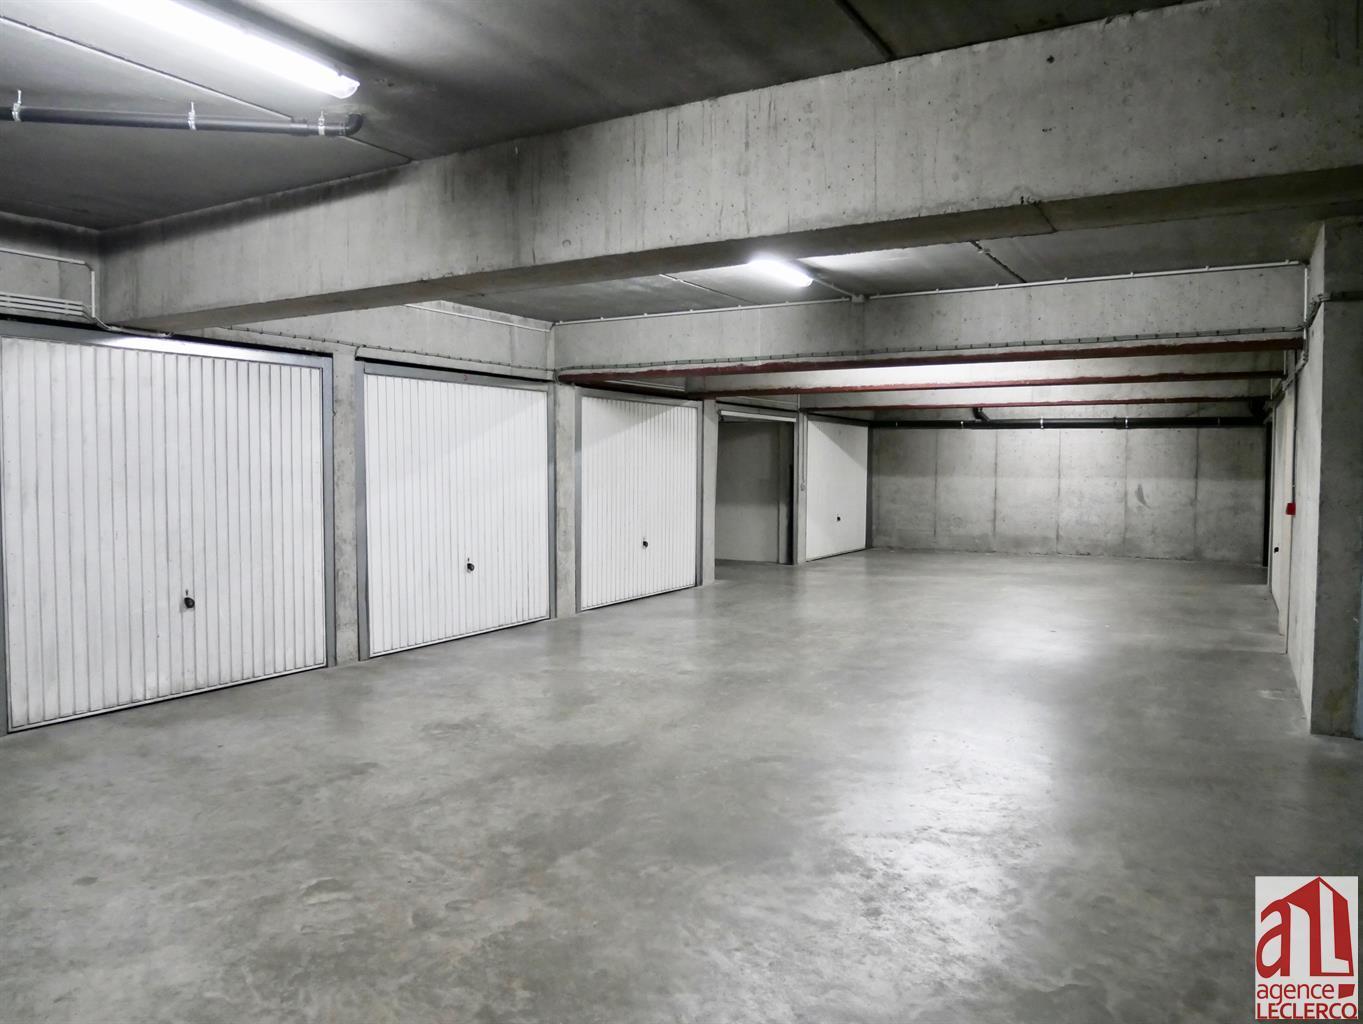 Appartement - Tournai - #4341090-9